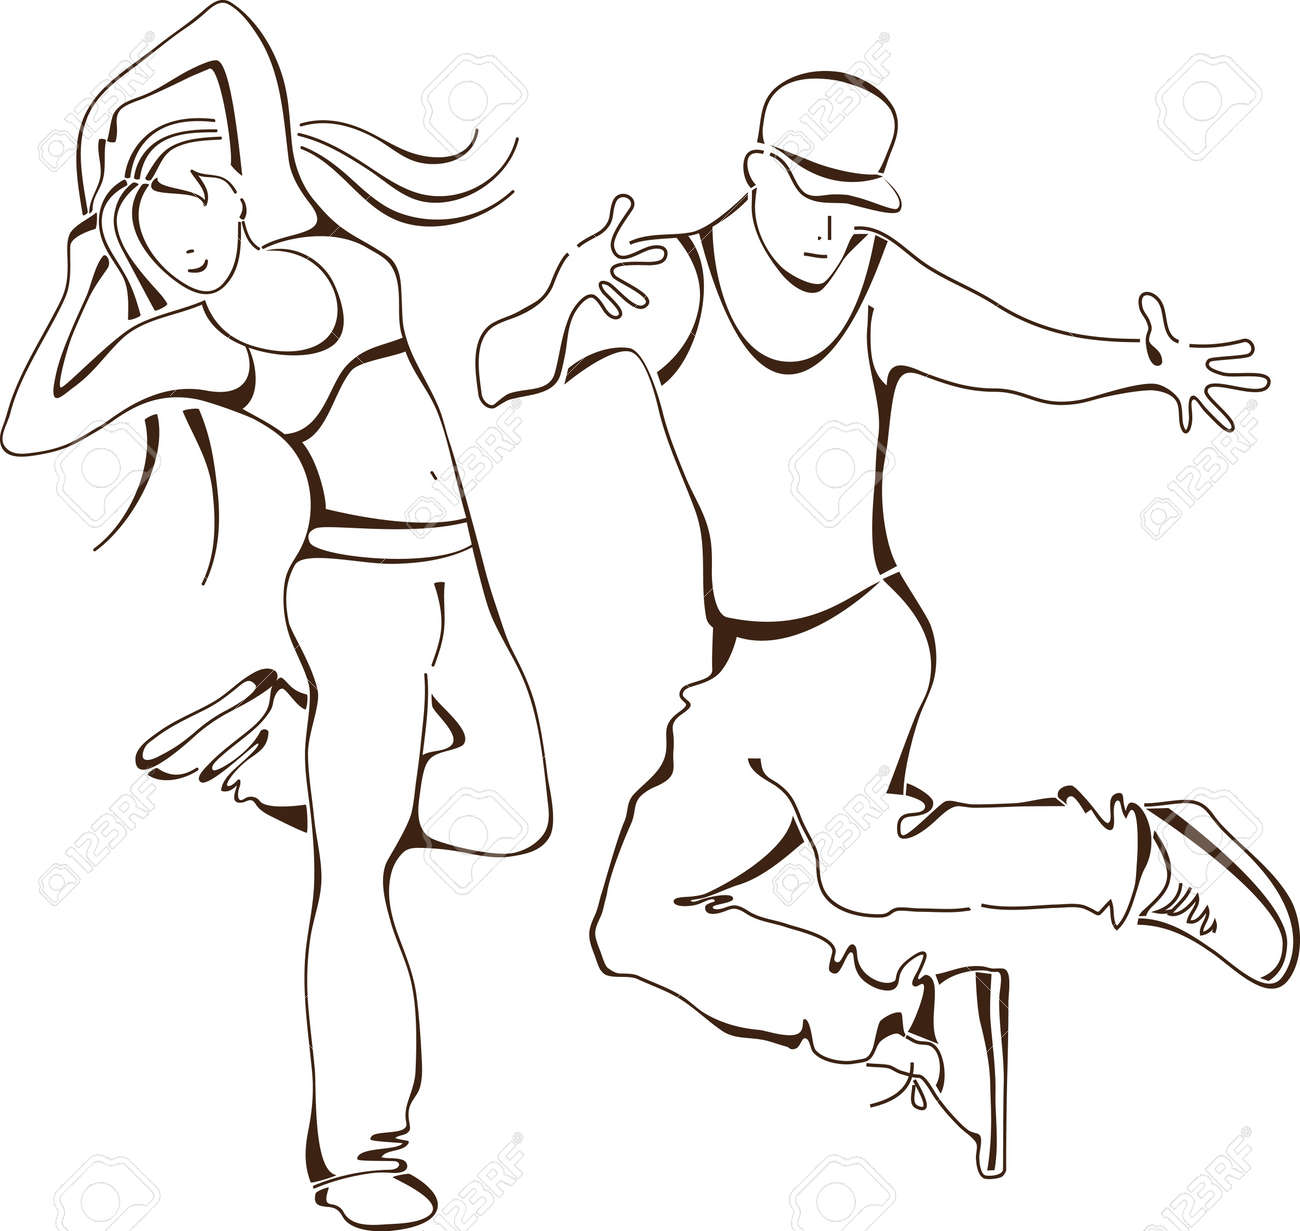 Hips Line Dance Hip-hop Dance Set Icon People